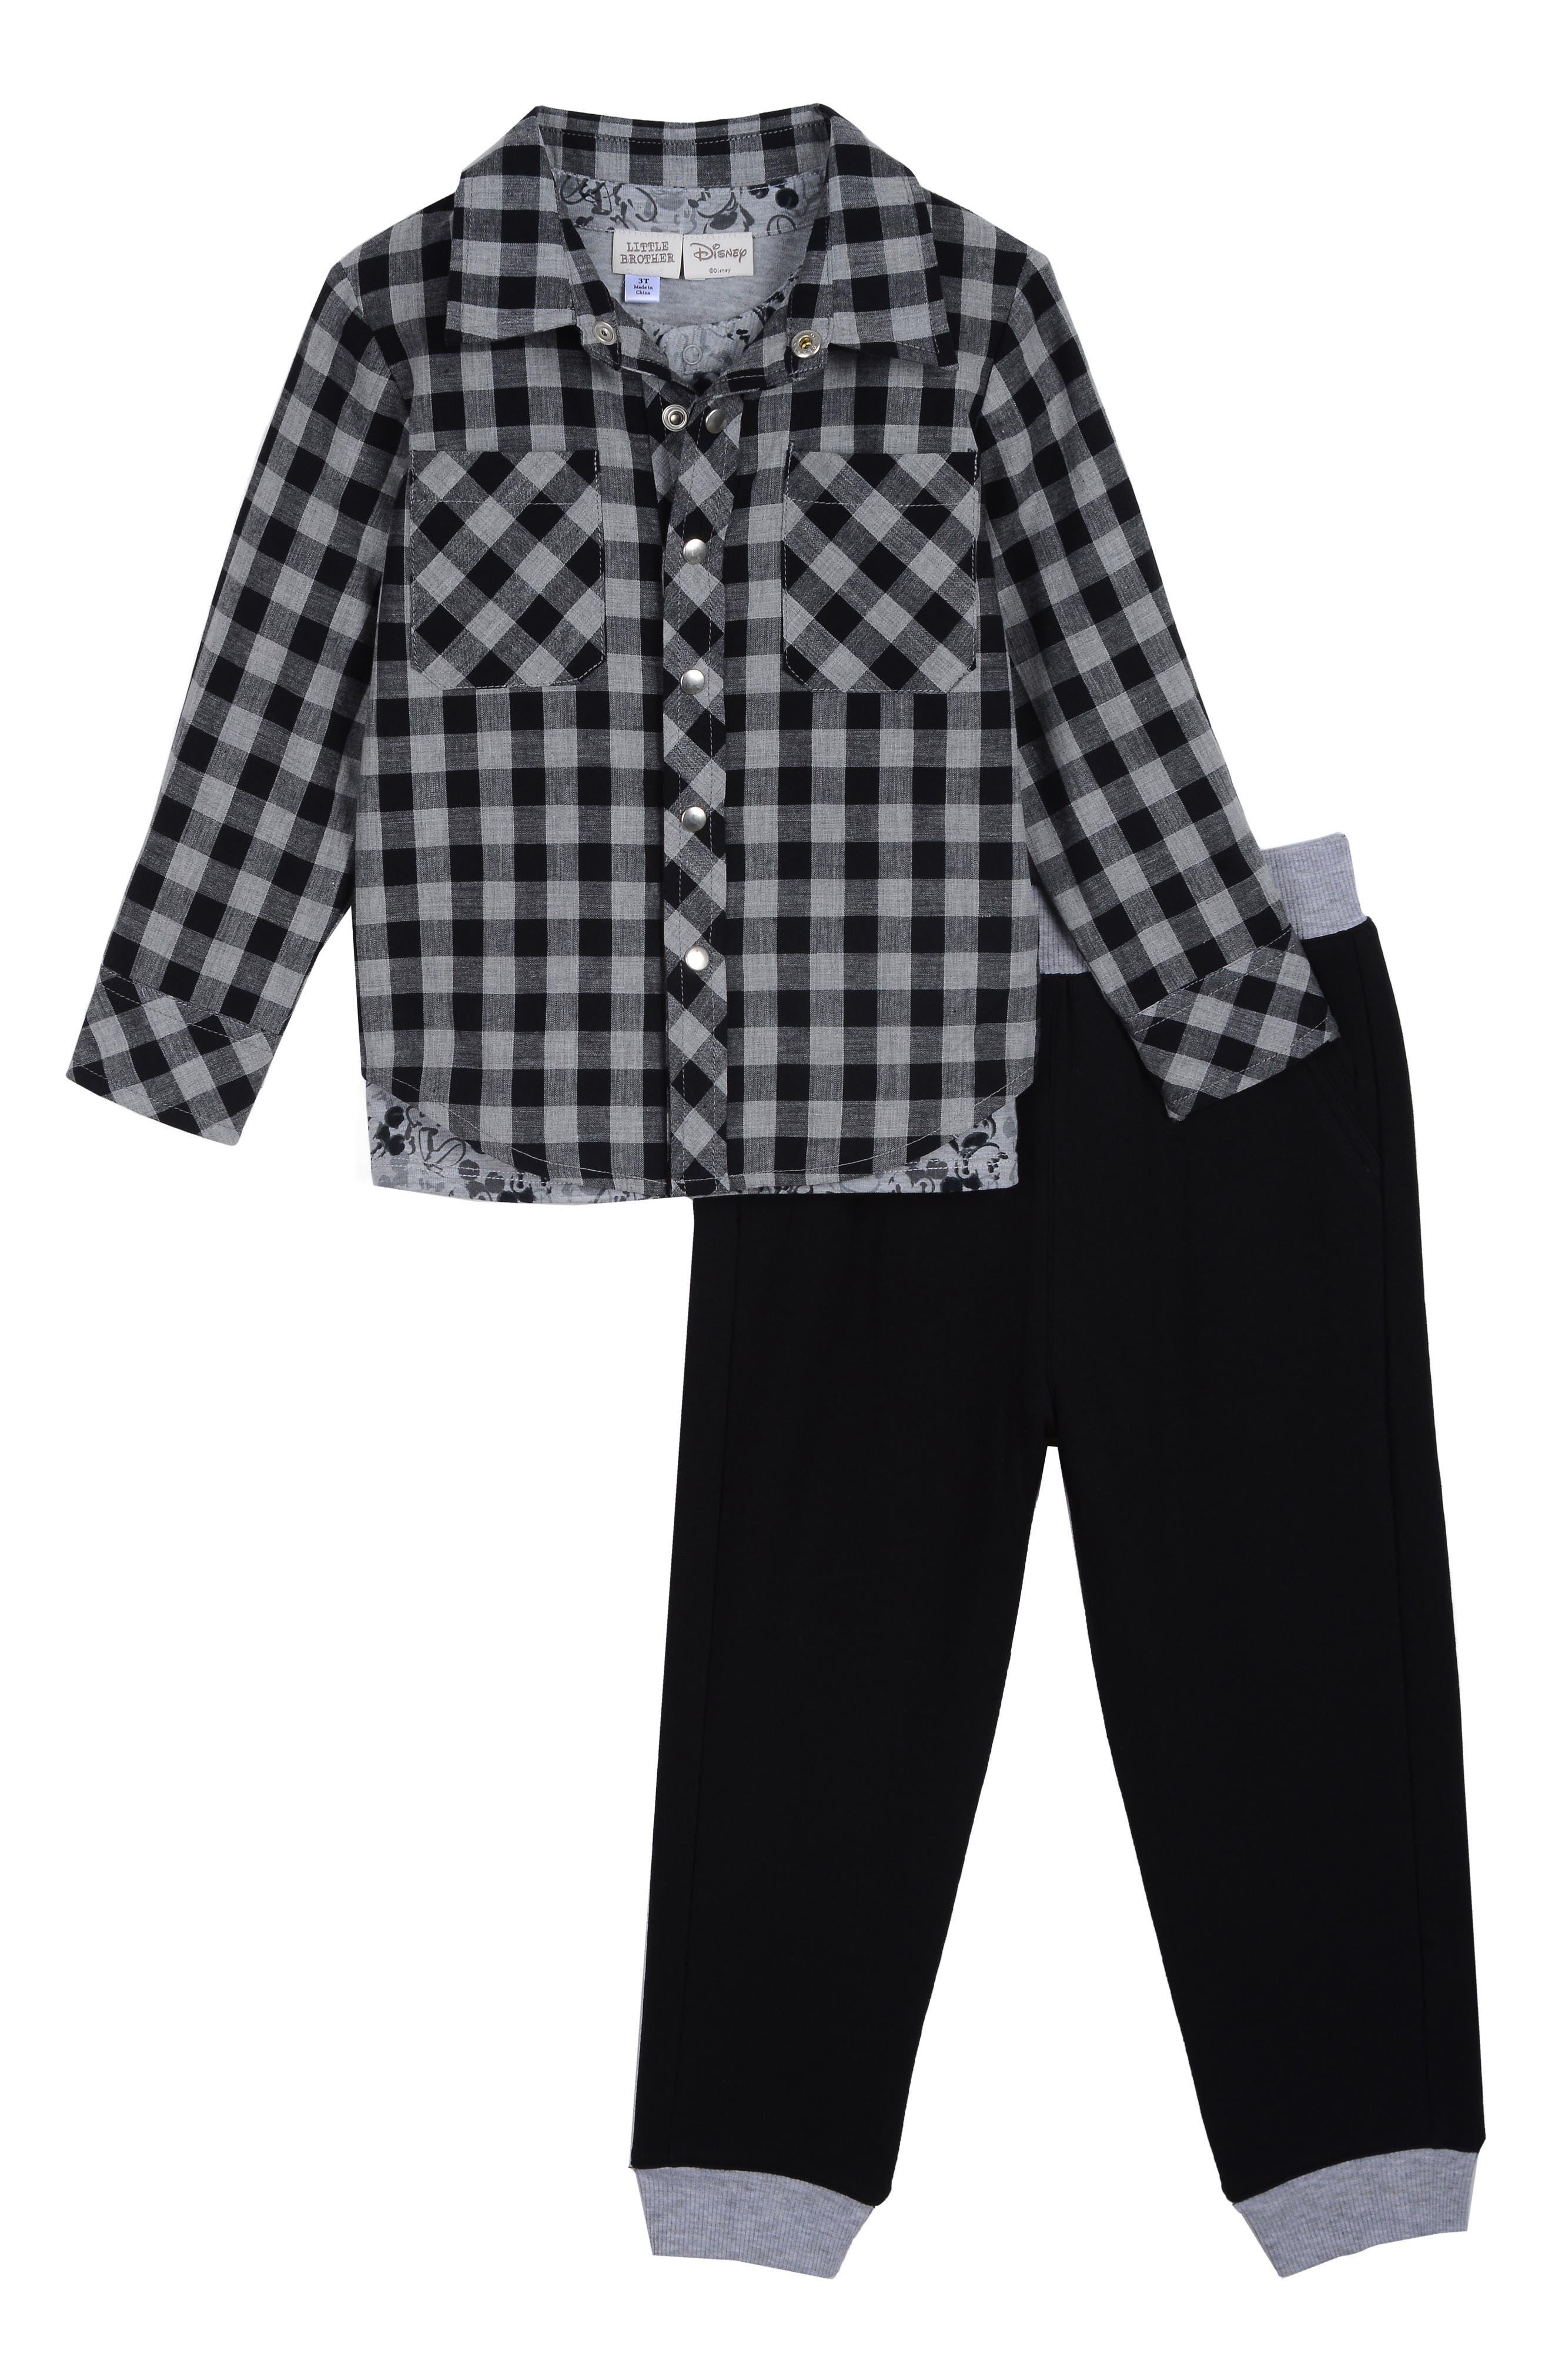 Toddler Boys Little Brother By Pippa  Julie X Disney Plaid Shirt TShirt  Pants Set